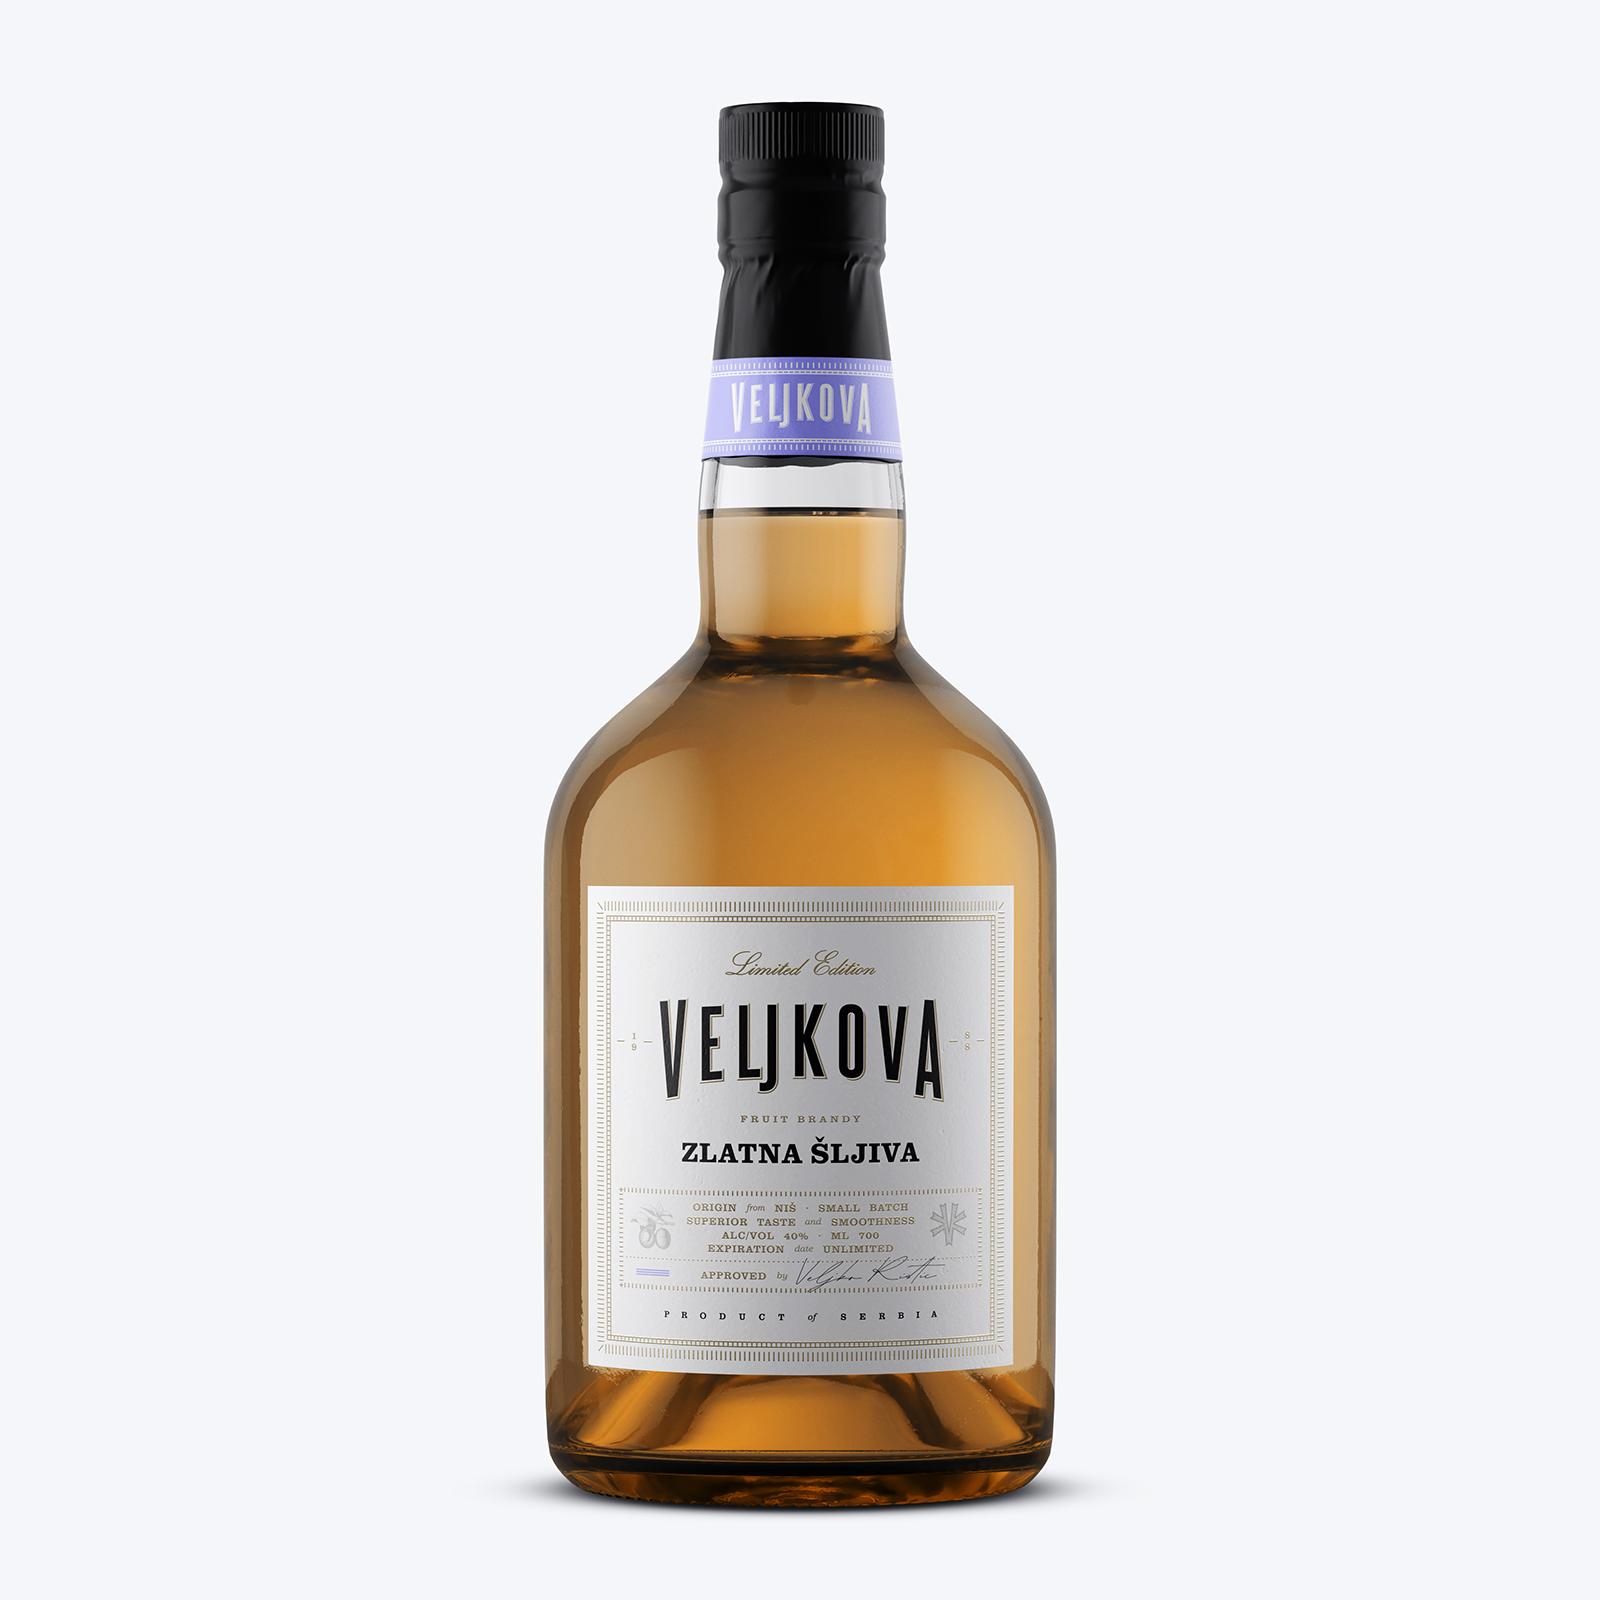 Veljkova Brandy Labels by bobo88dsgn